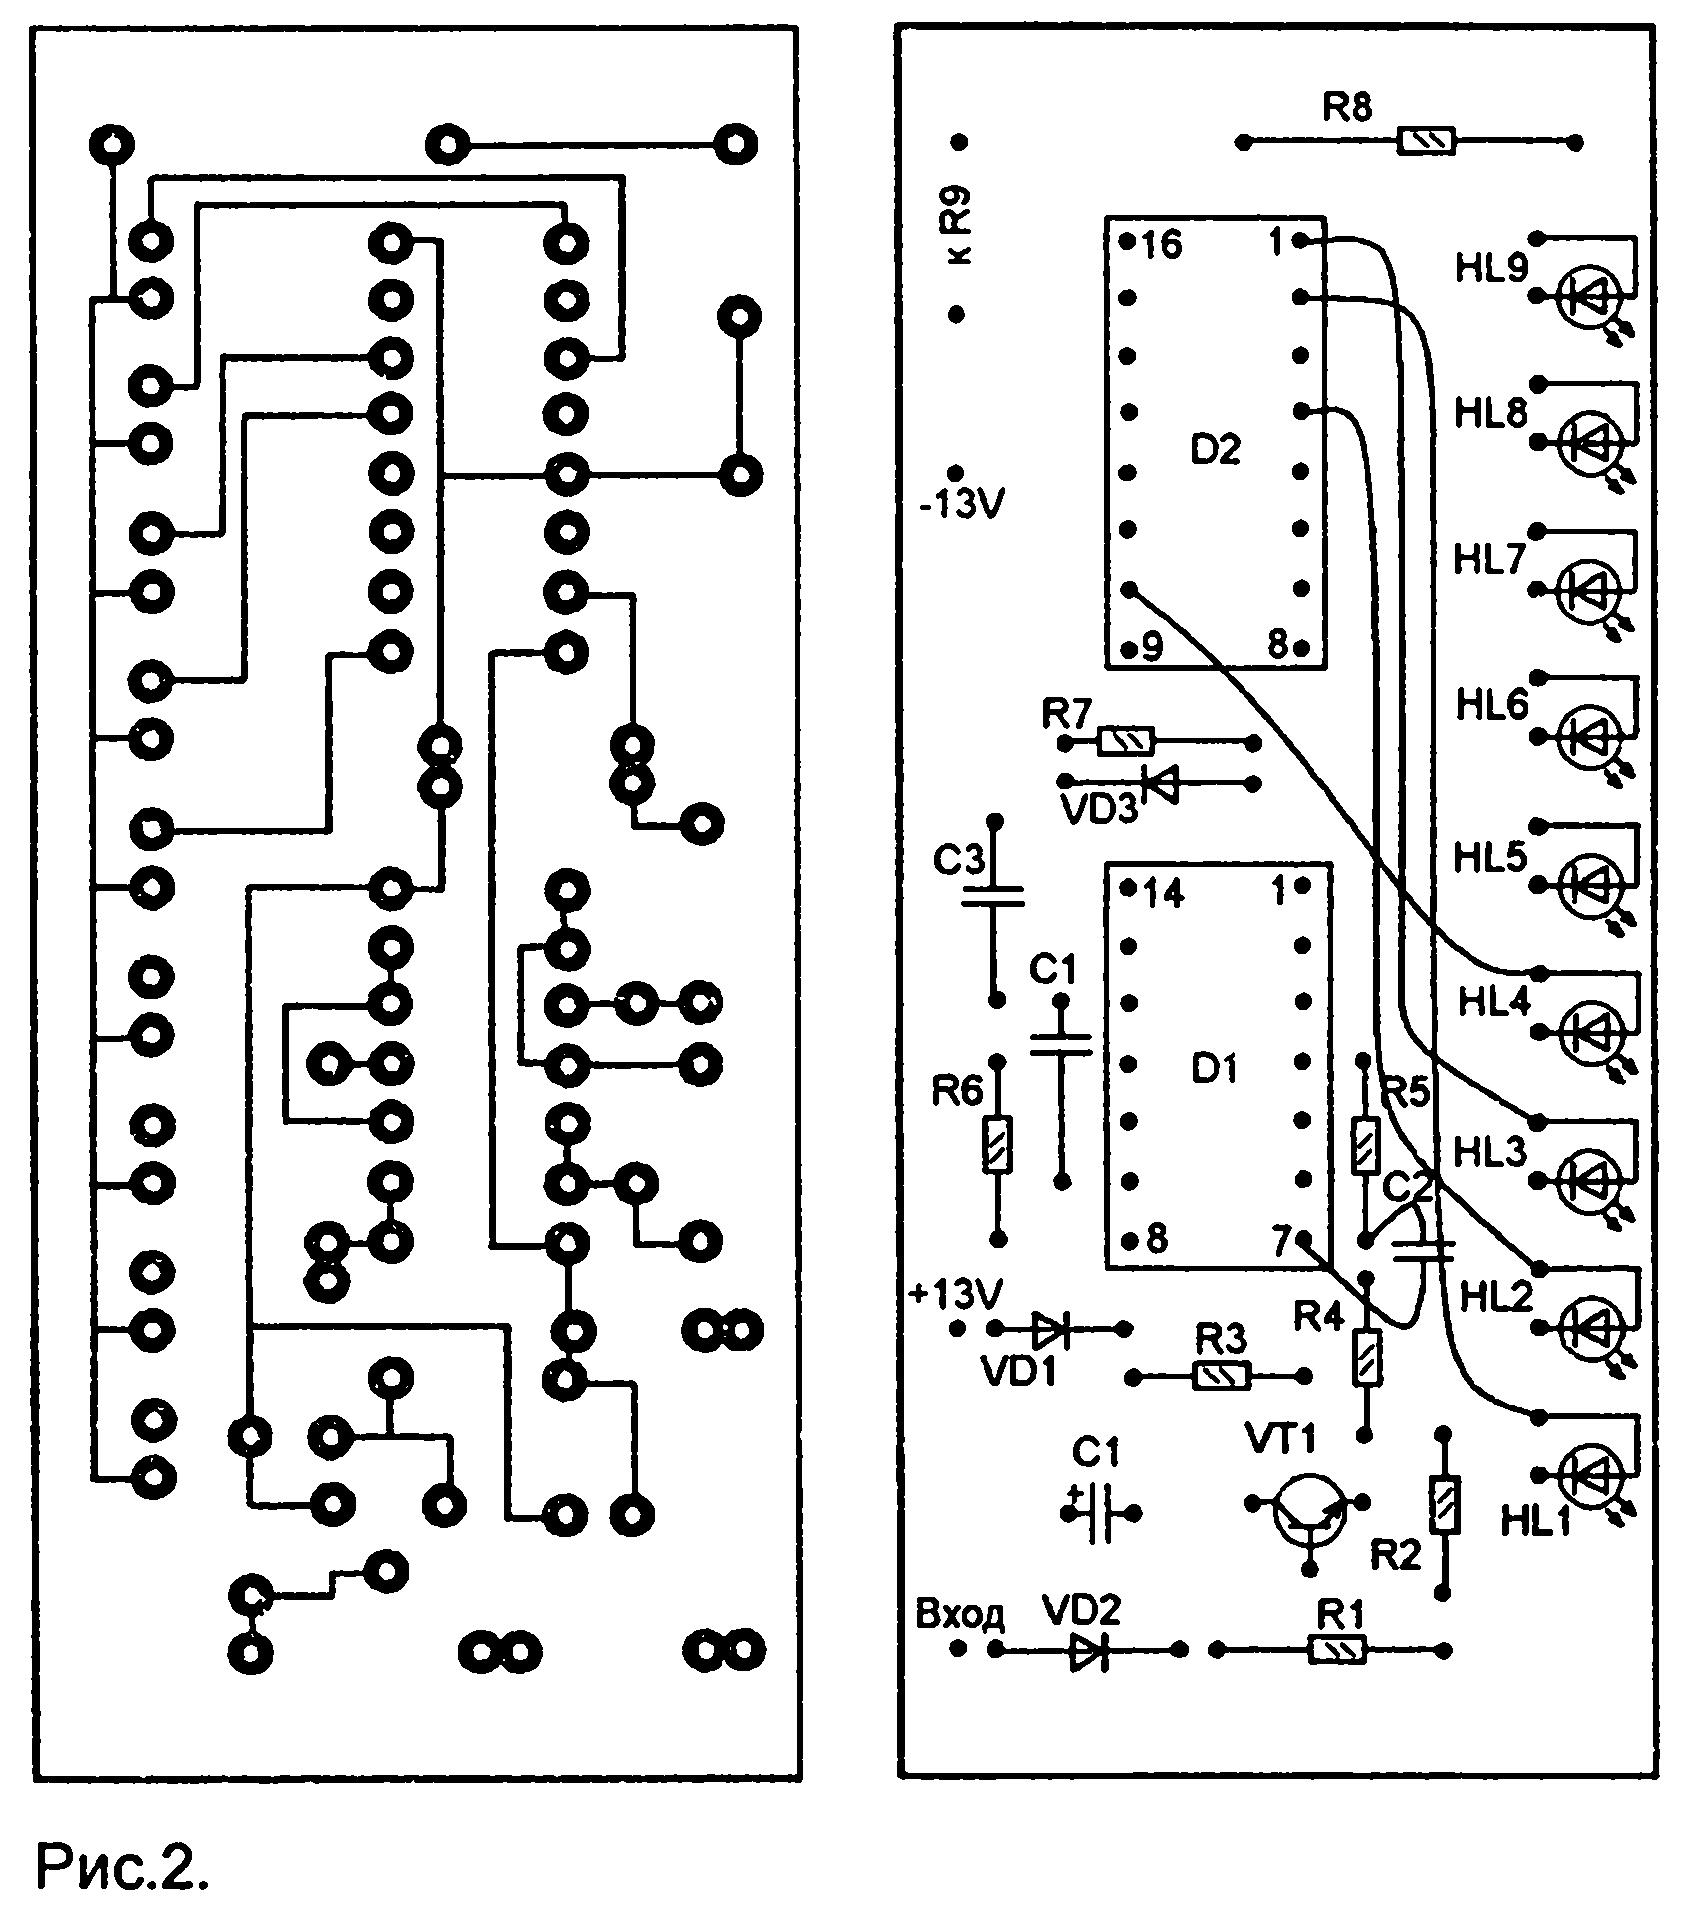 схема амперметра на микросхеме lm324